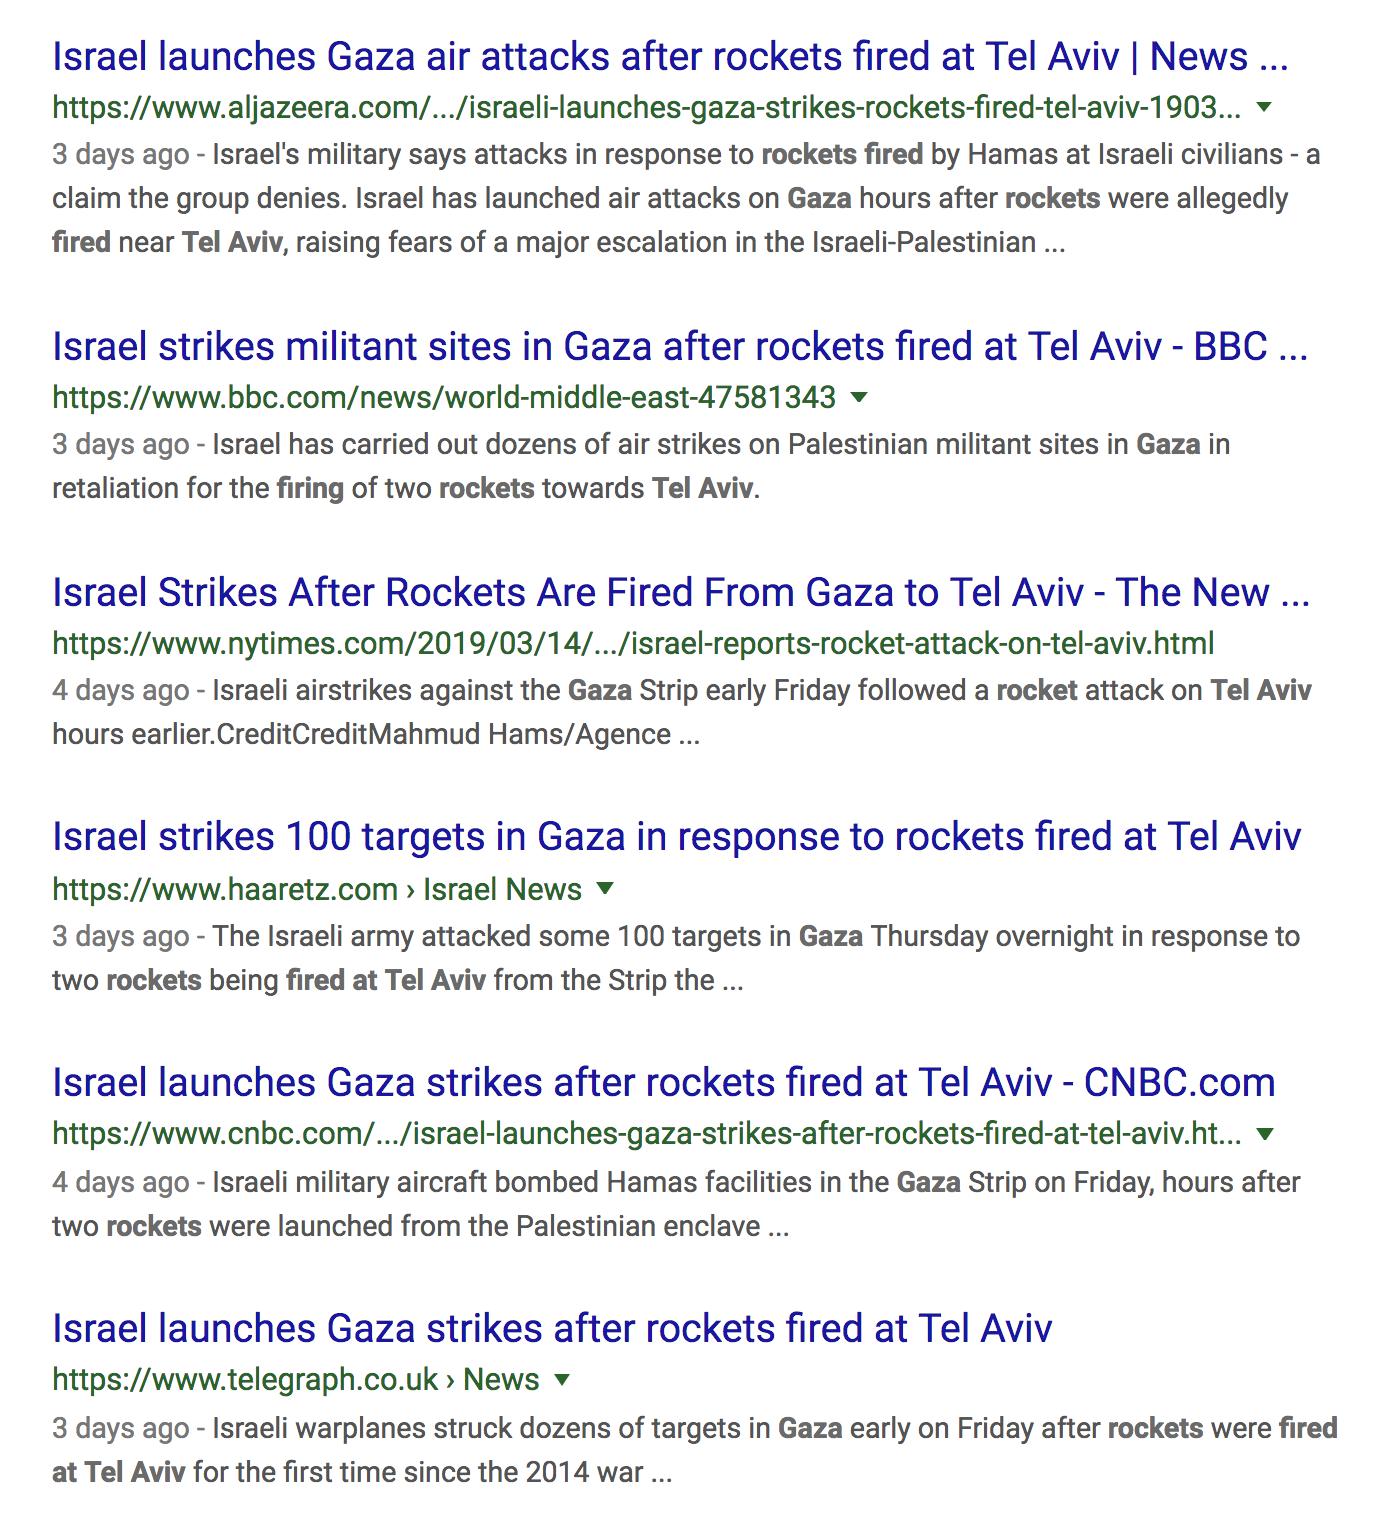 New York Times changes headline to make Israel seem more